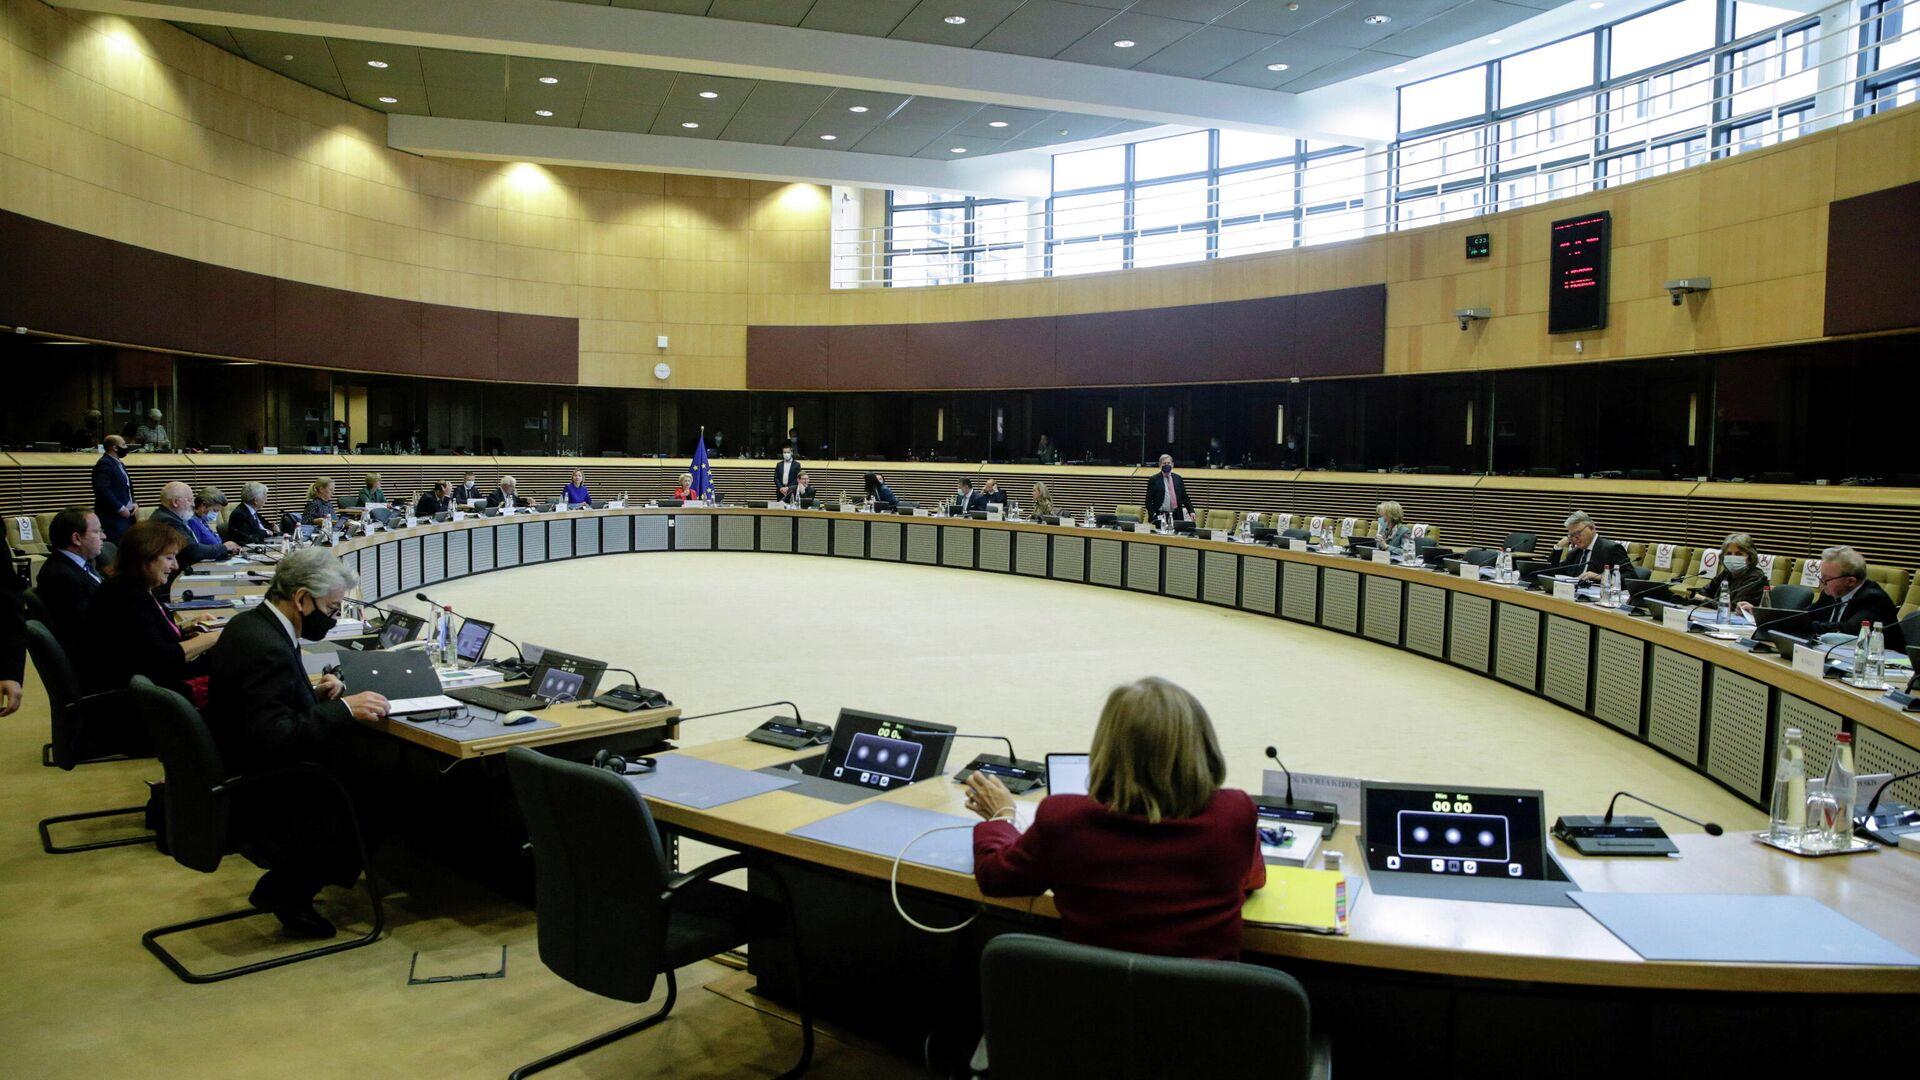 Sitzung des Kollegiums der EU-Kommissare. Brüssel, 13. Oktober 2021 - SNA, 1920, 13.10.2021